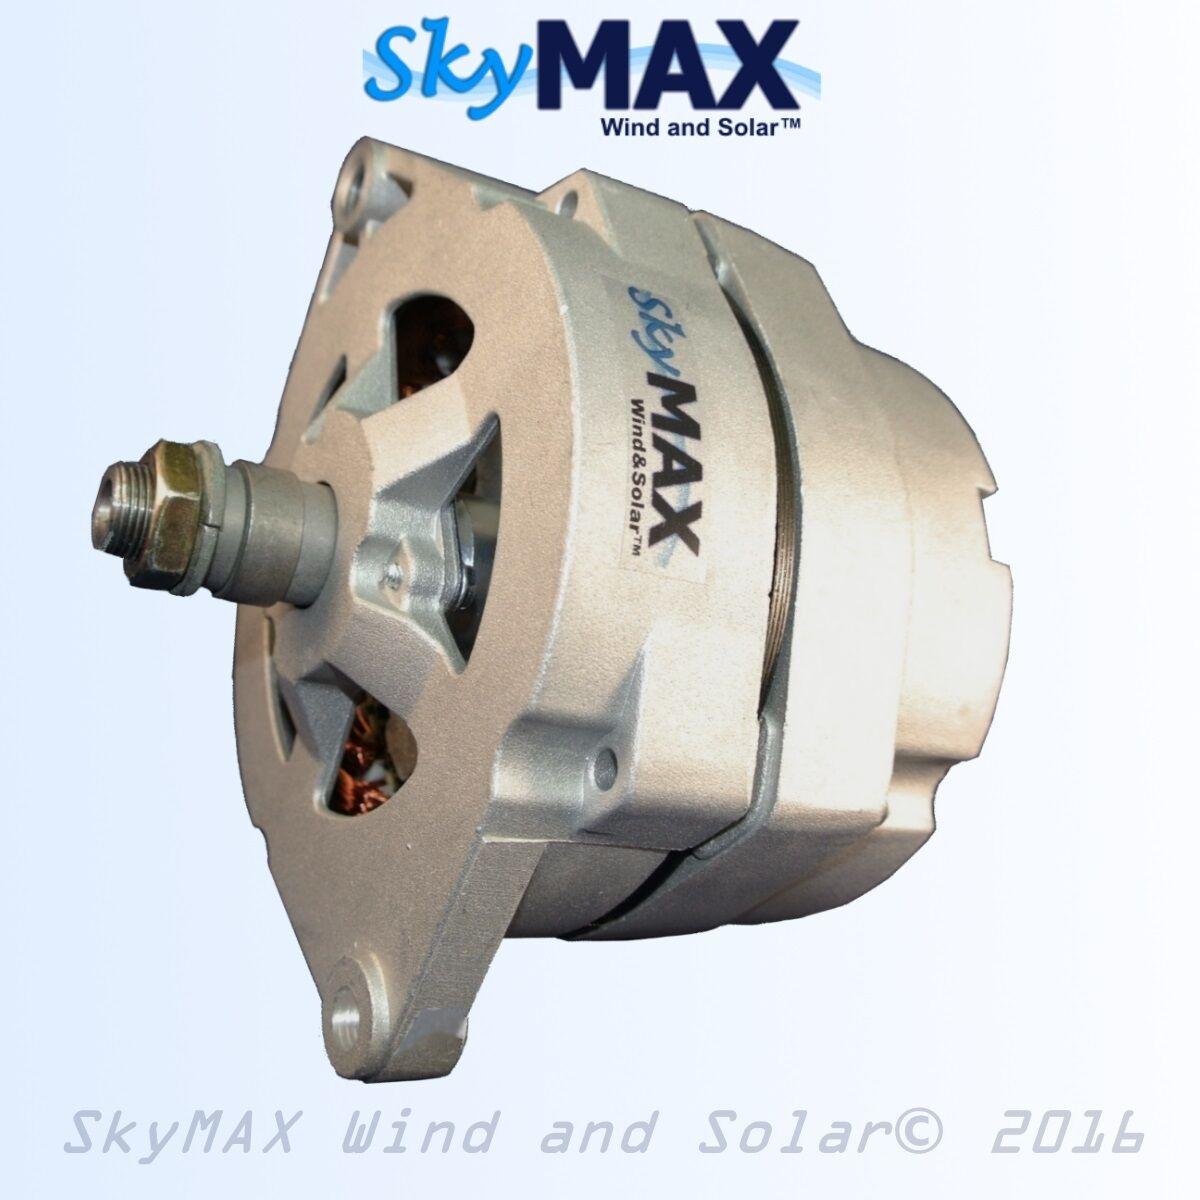 Dc Permanent Magnet Alternator 12 Volt For Building A Wind Turbine Generator Pmg Ebay